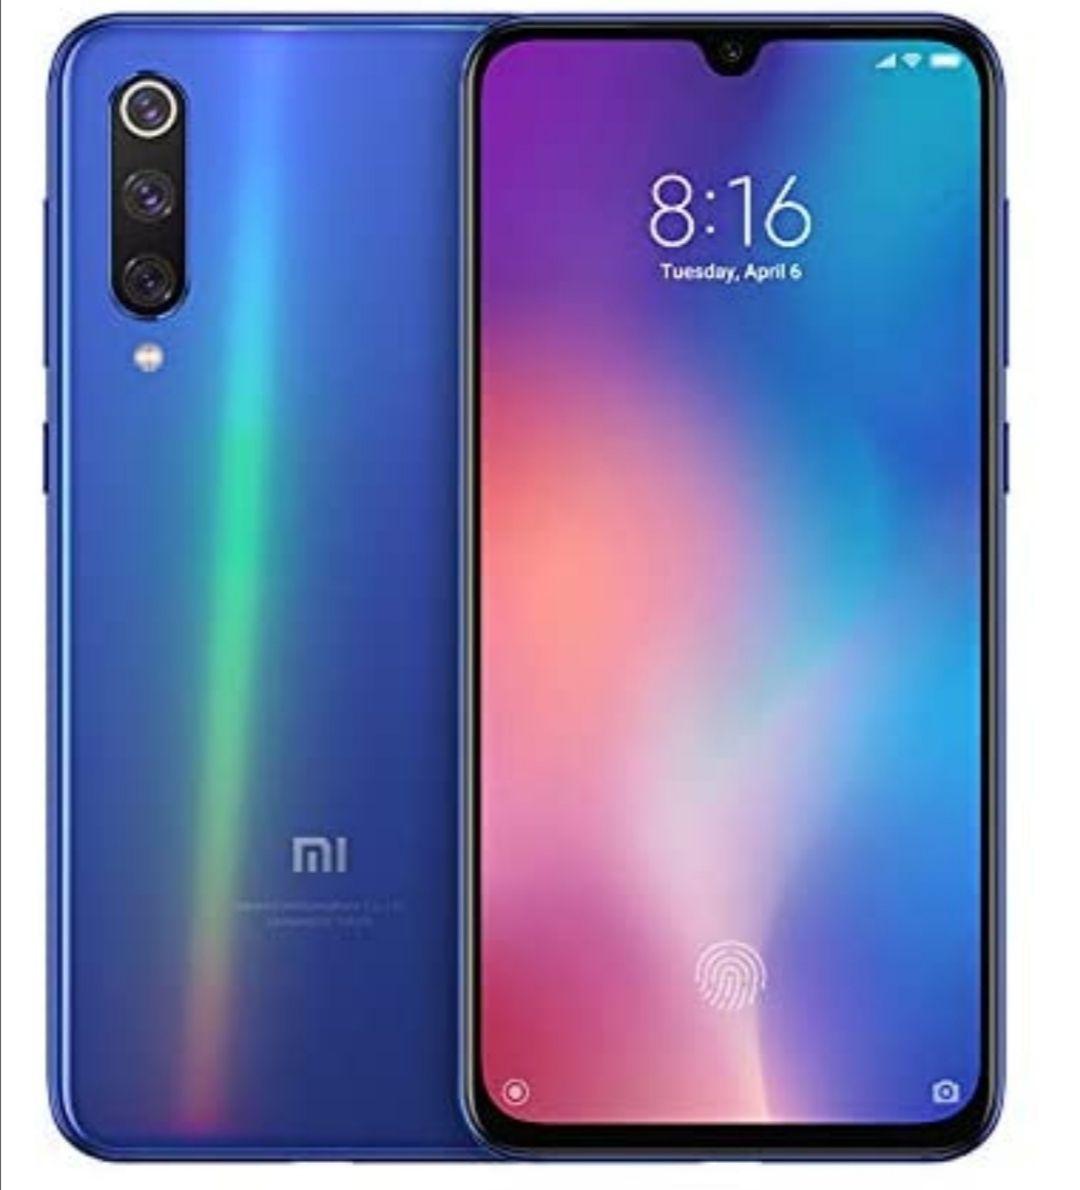 Xiaomi Mi 9 SE, Dual Sim 64GB 6GB RAM, Full UK Warranty- Ocean Blue/Black Good Condition Smartphone - £167.99 @ Sold By Livewire Telecom FBA